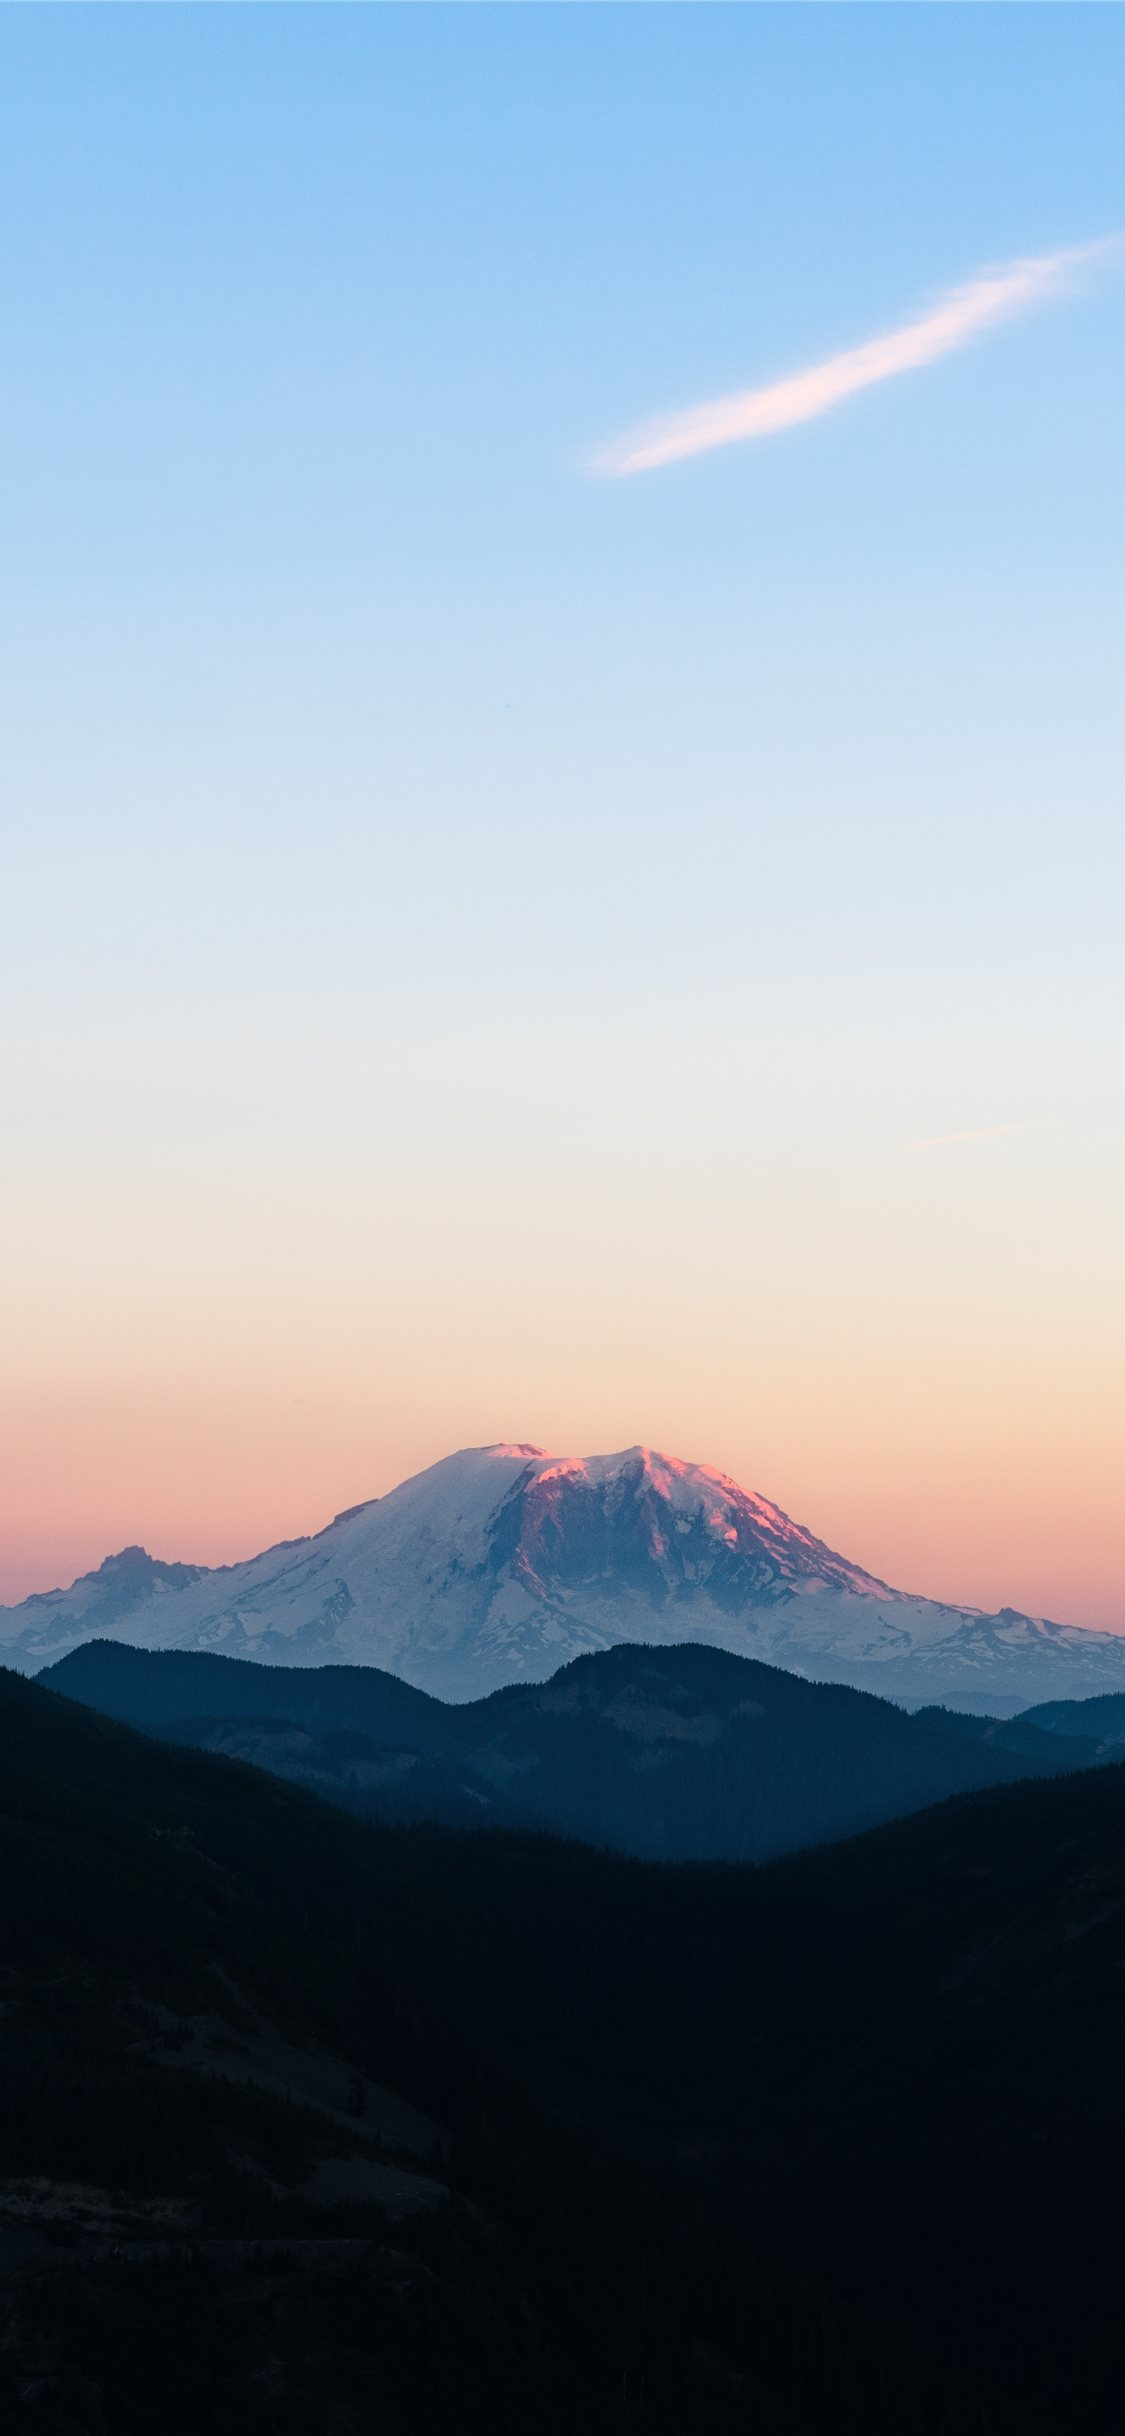 Mountain Rainier National Park Wa Iphone X Wallpapers Free Download